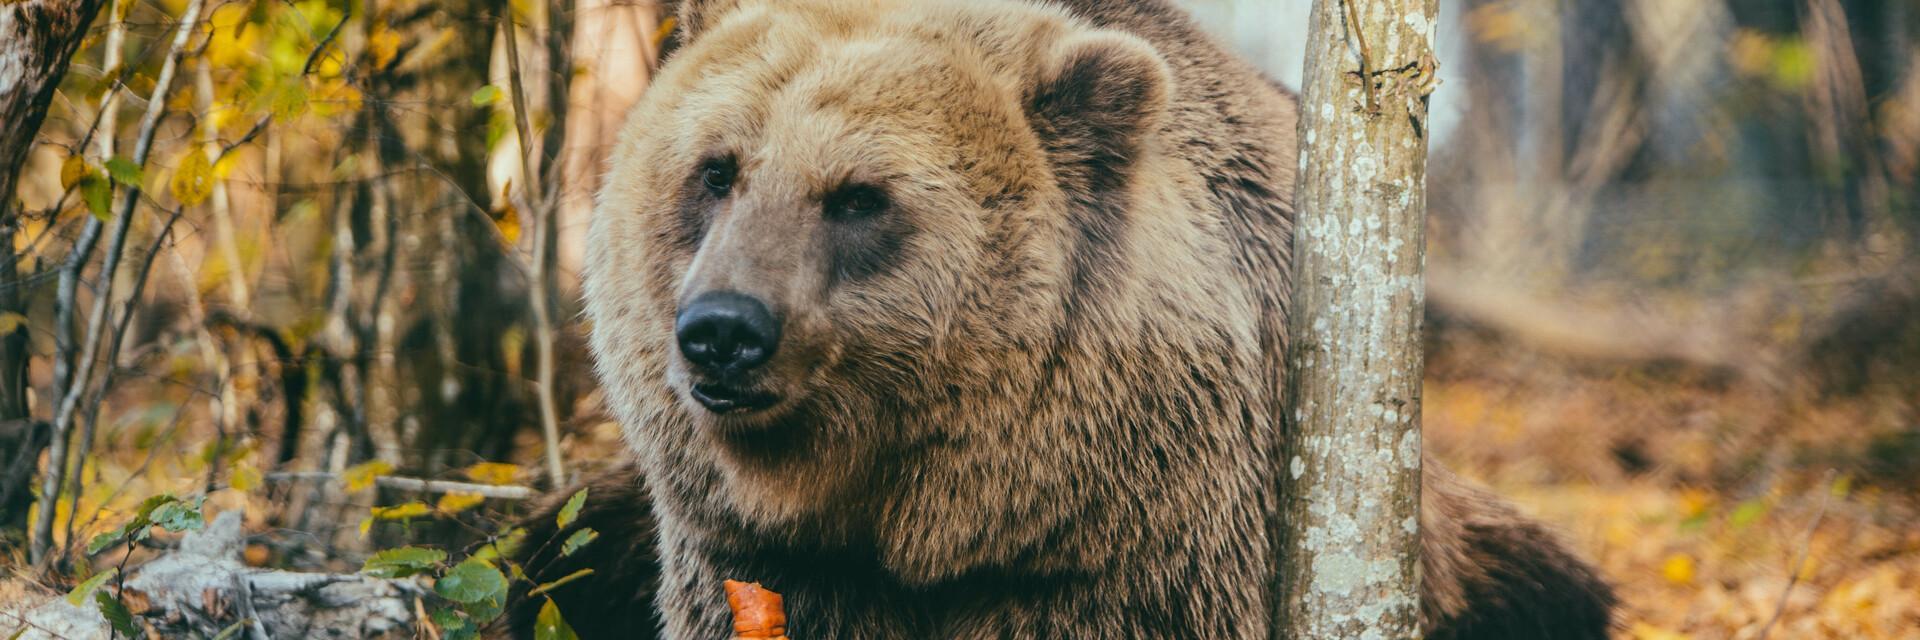 Bear Melanka in BEAR SANCTUARY Domazhyr